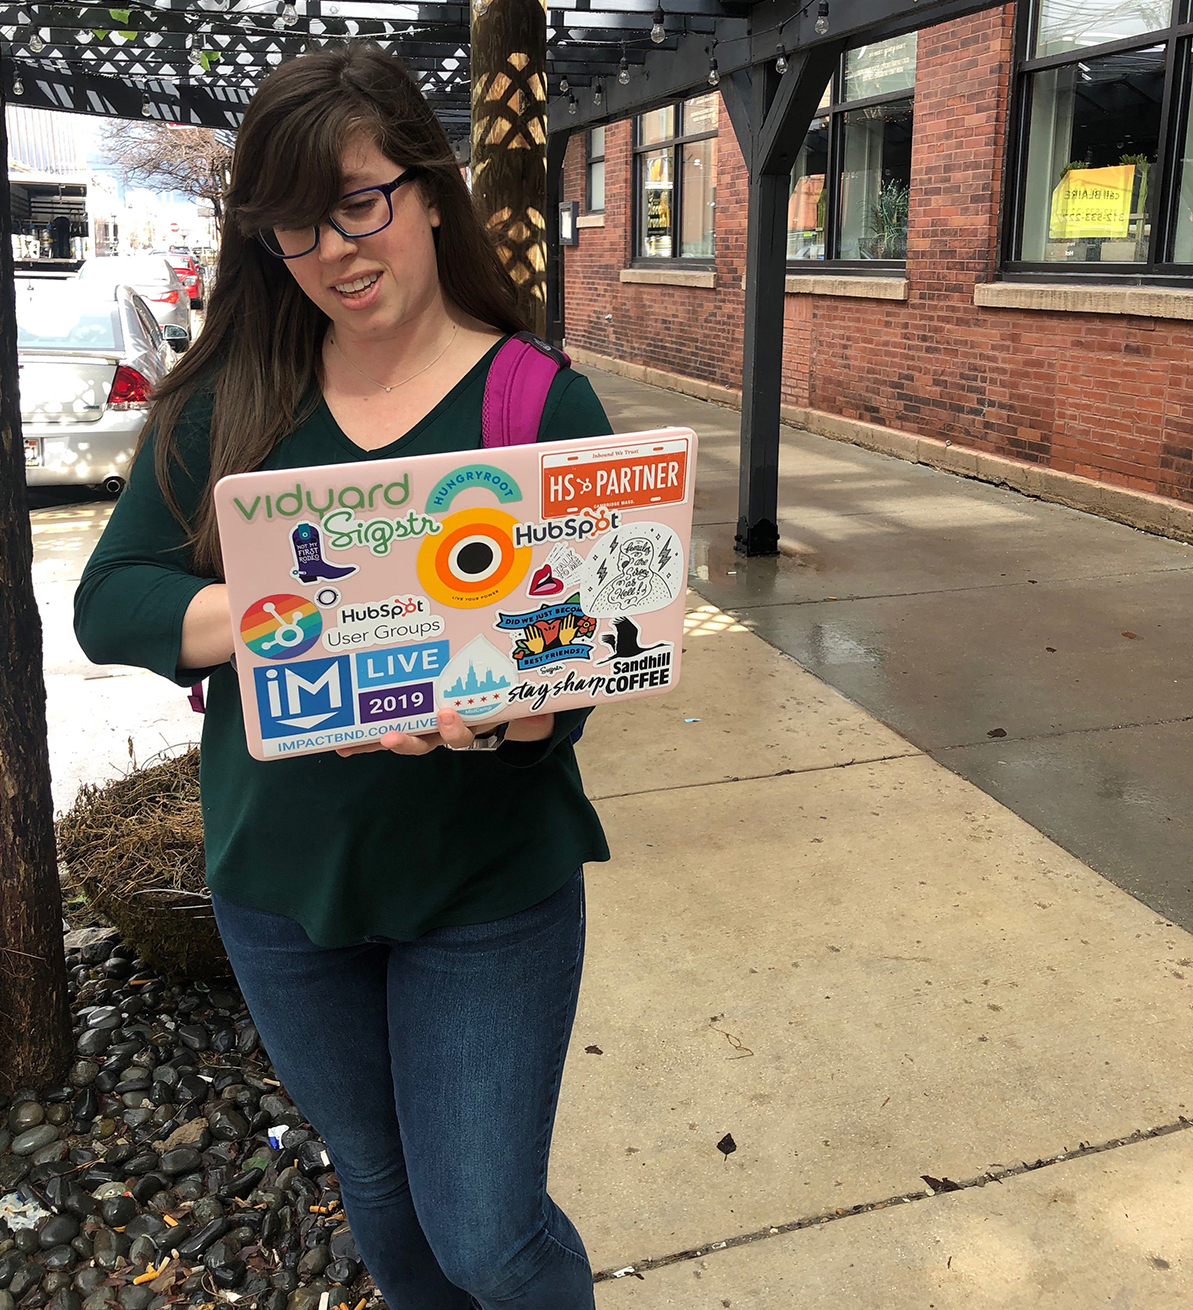 17 stephanie walking with laptop